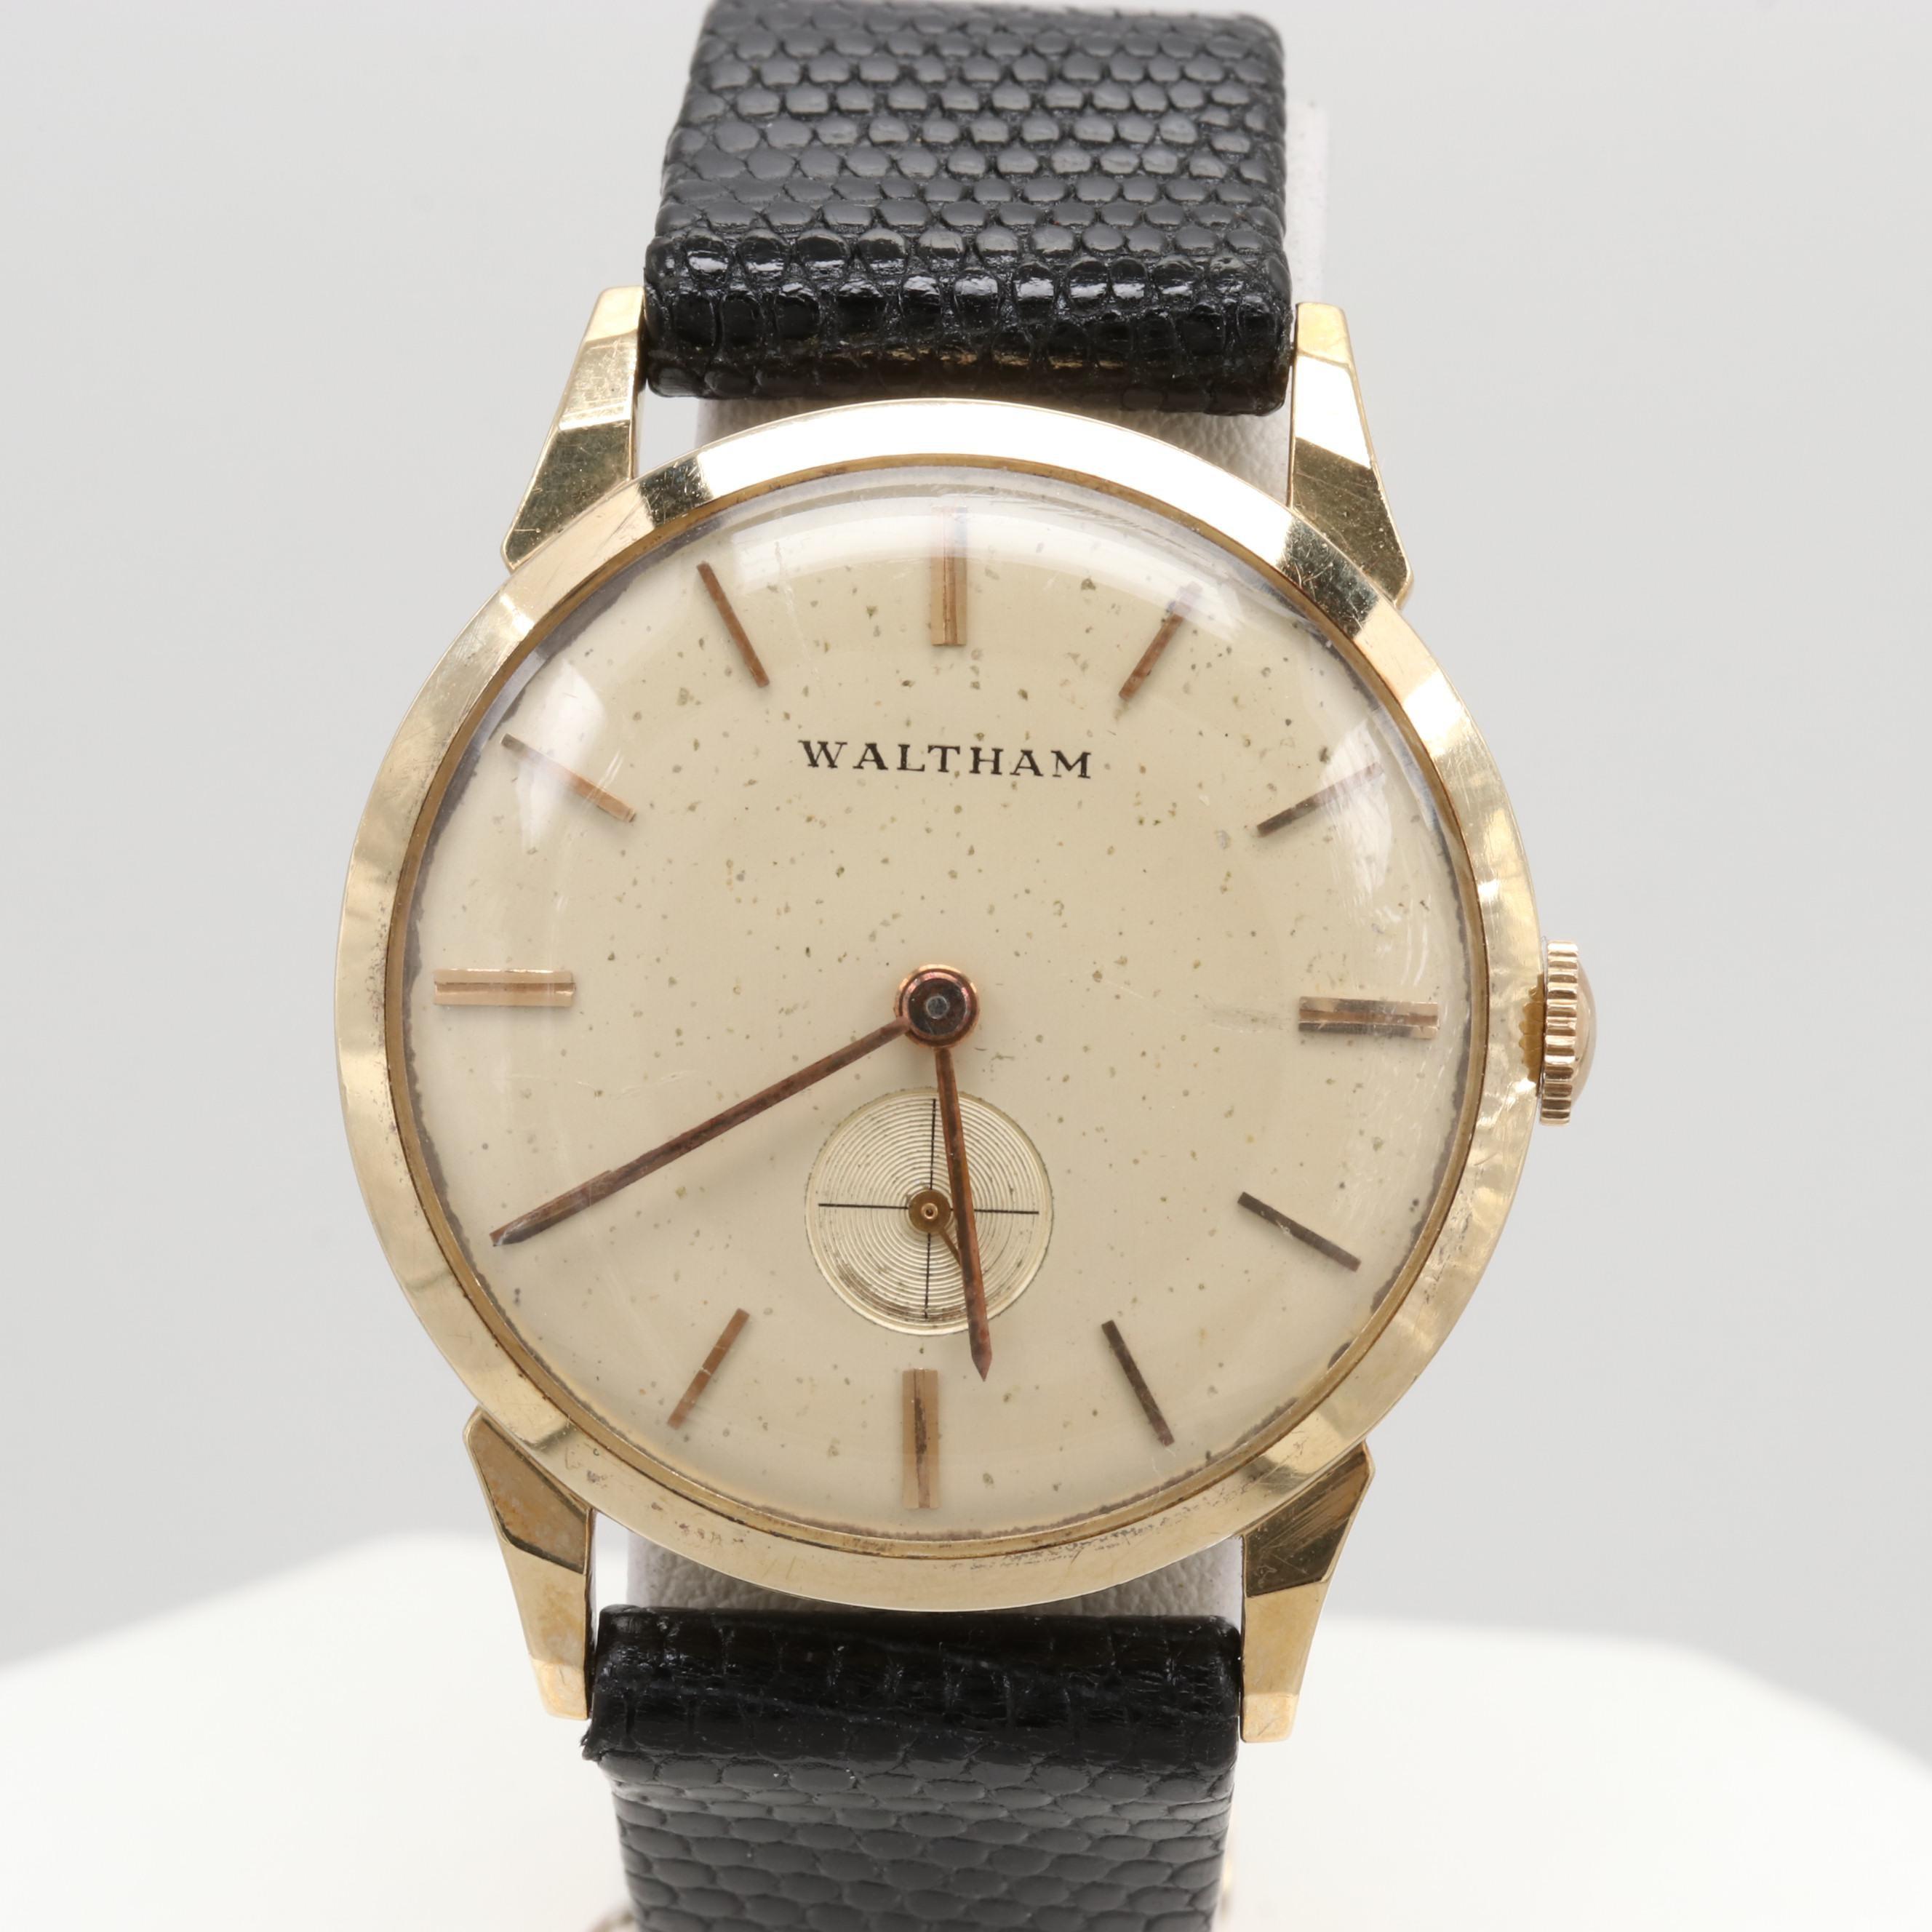 Vintage Waltham 14K Yellow Gold Stem Wind Wristwatch